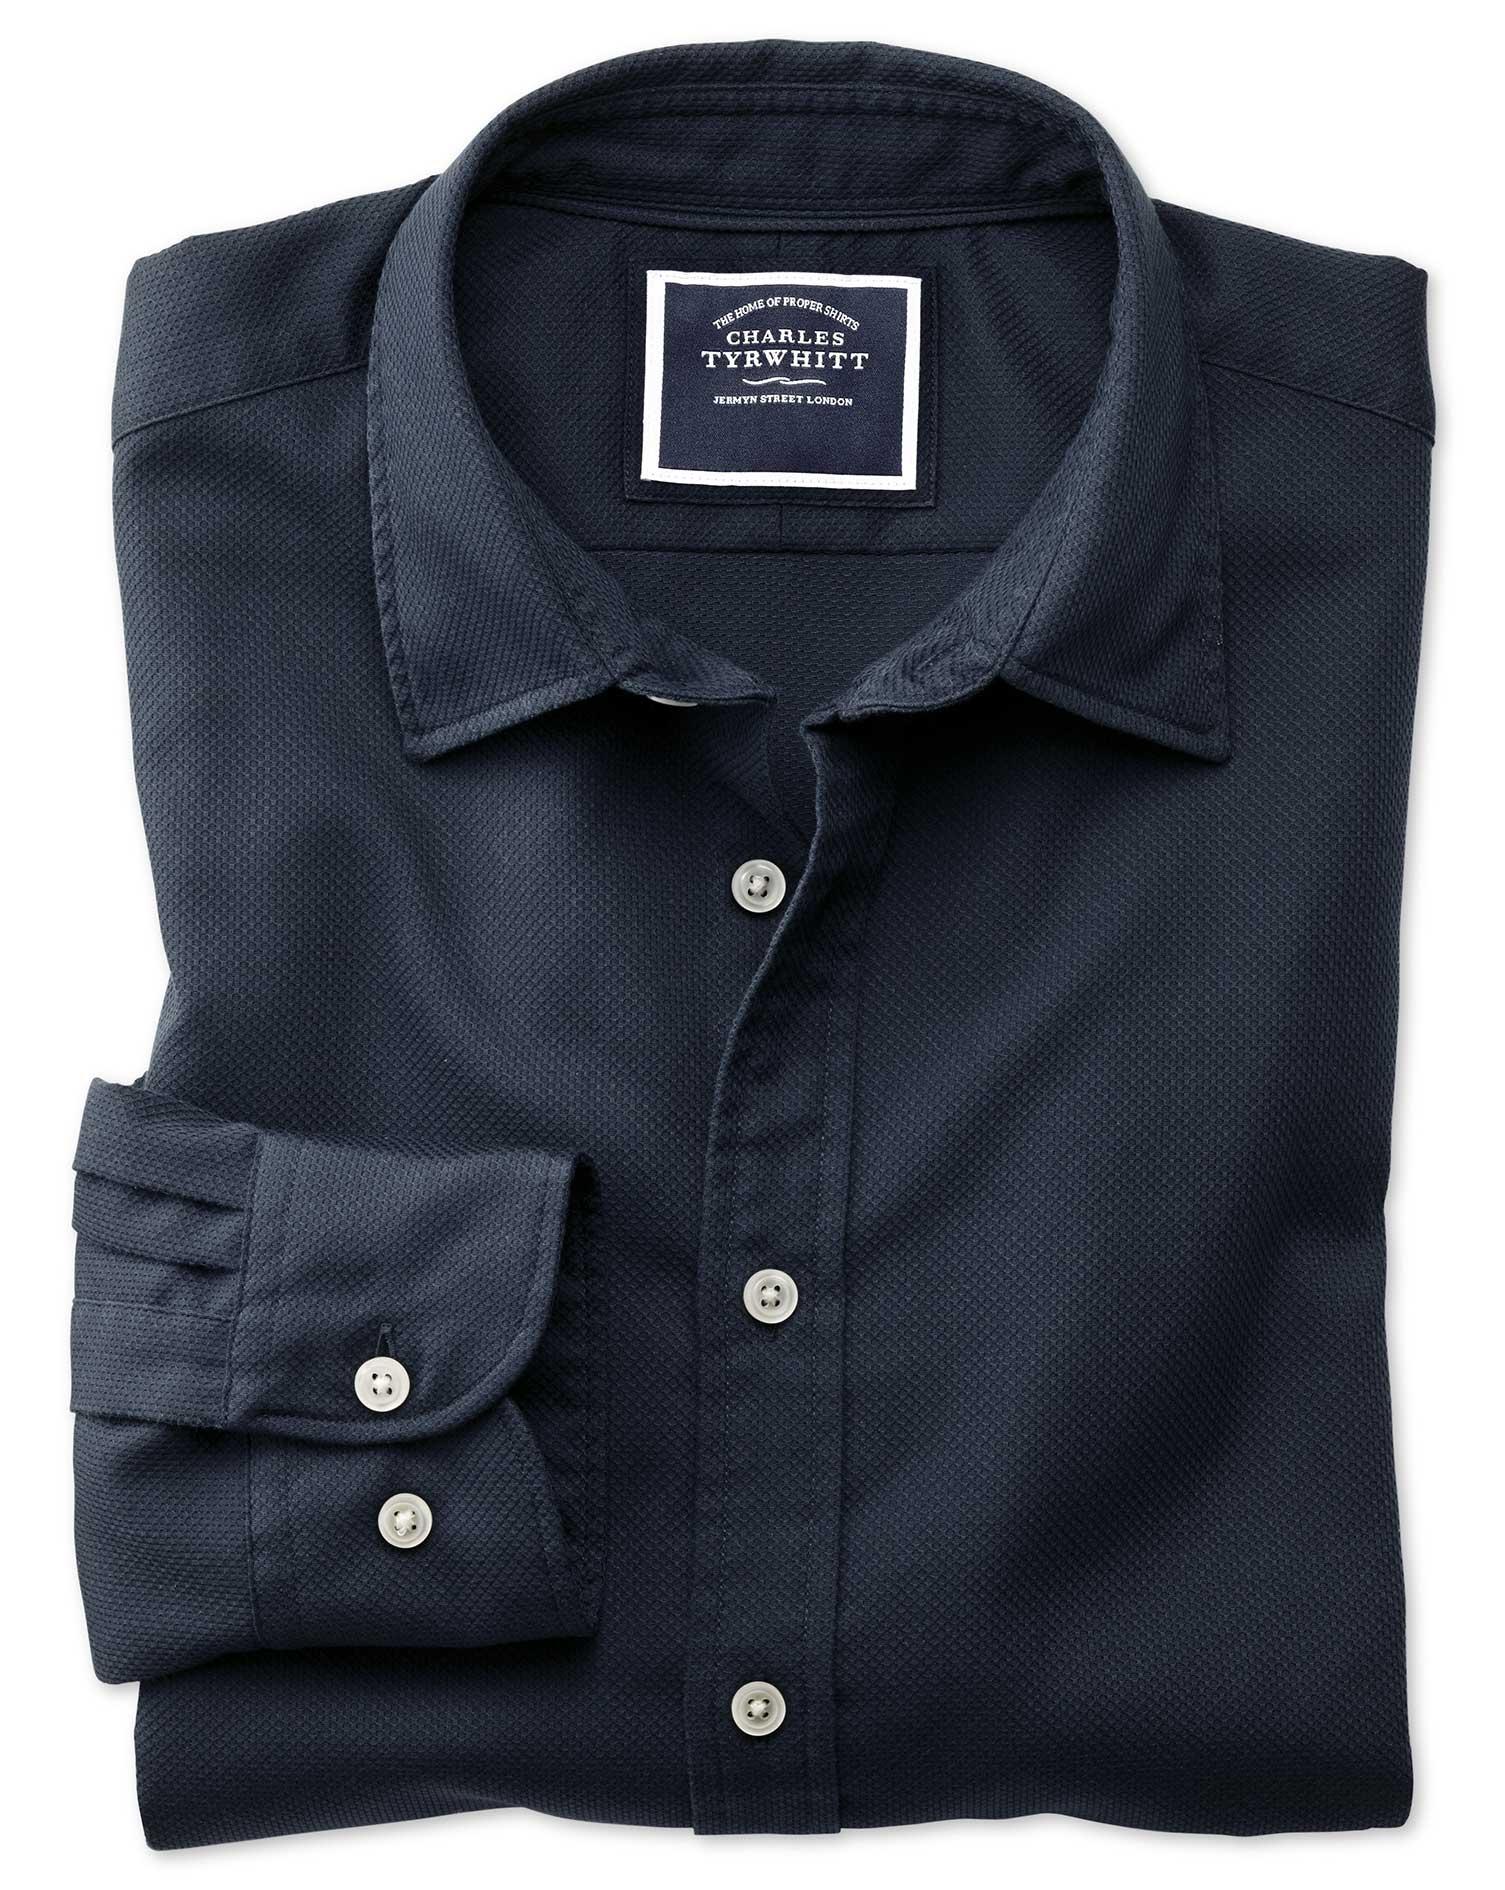 Slim Fit Washed Dark Navy Honeycomb Textured Cotton Shirt Single Cuff Size XL by Charles Tyrwhitt